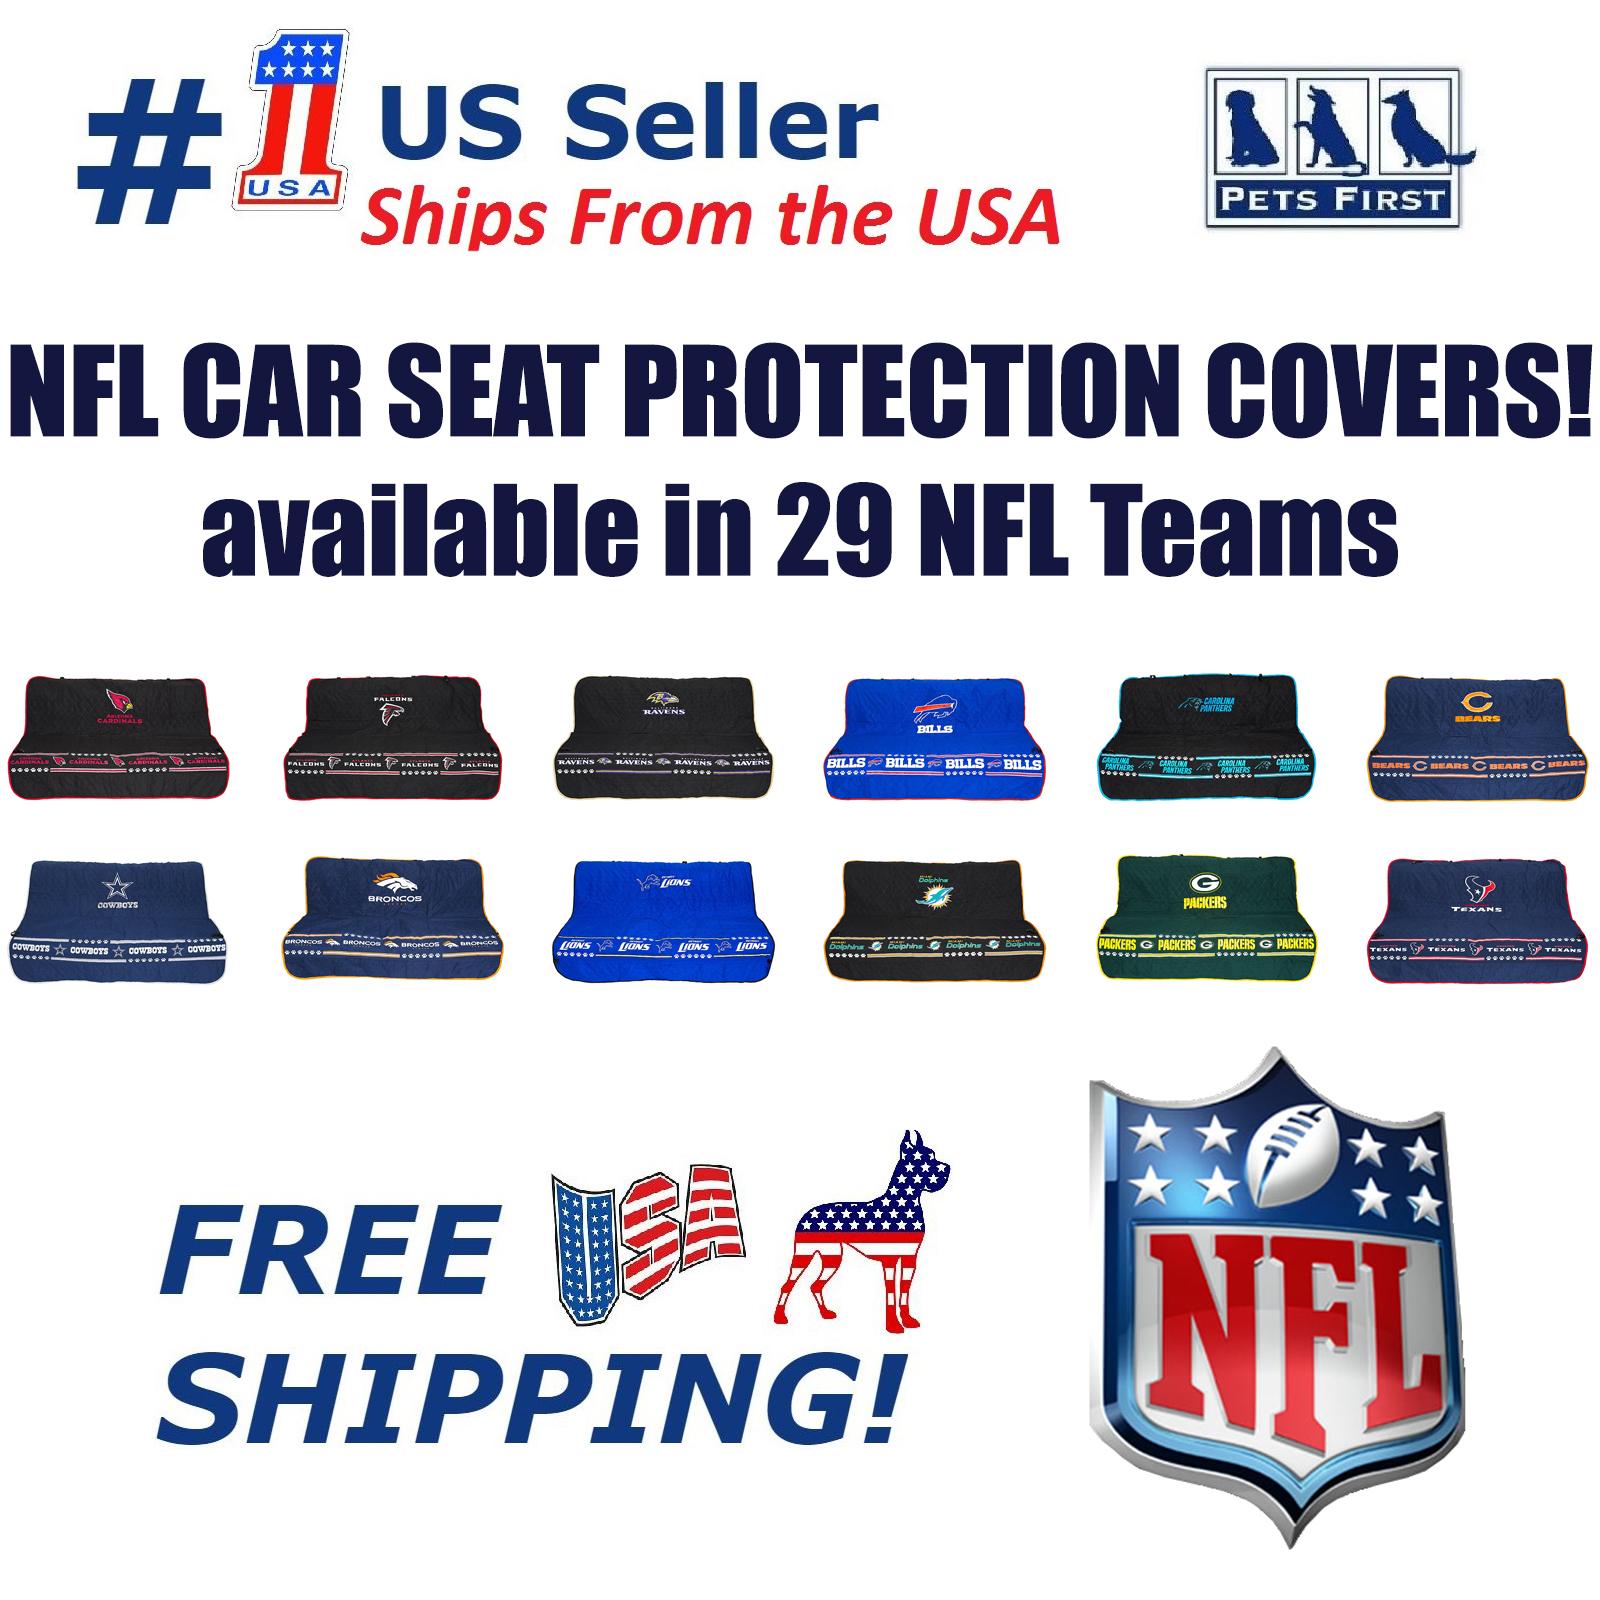 2-Pack Trucks//Large SUV/'s Licensed NFL Atlanta Falcons Car Mirror Covers